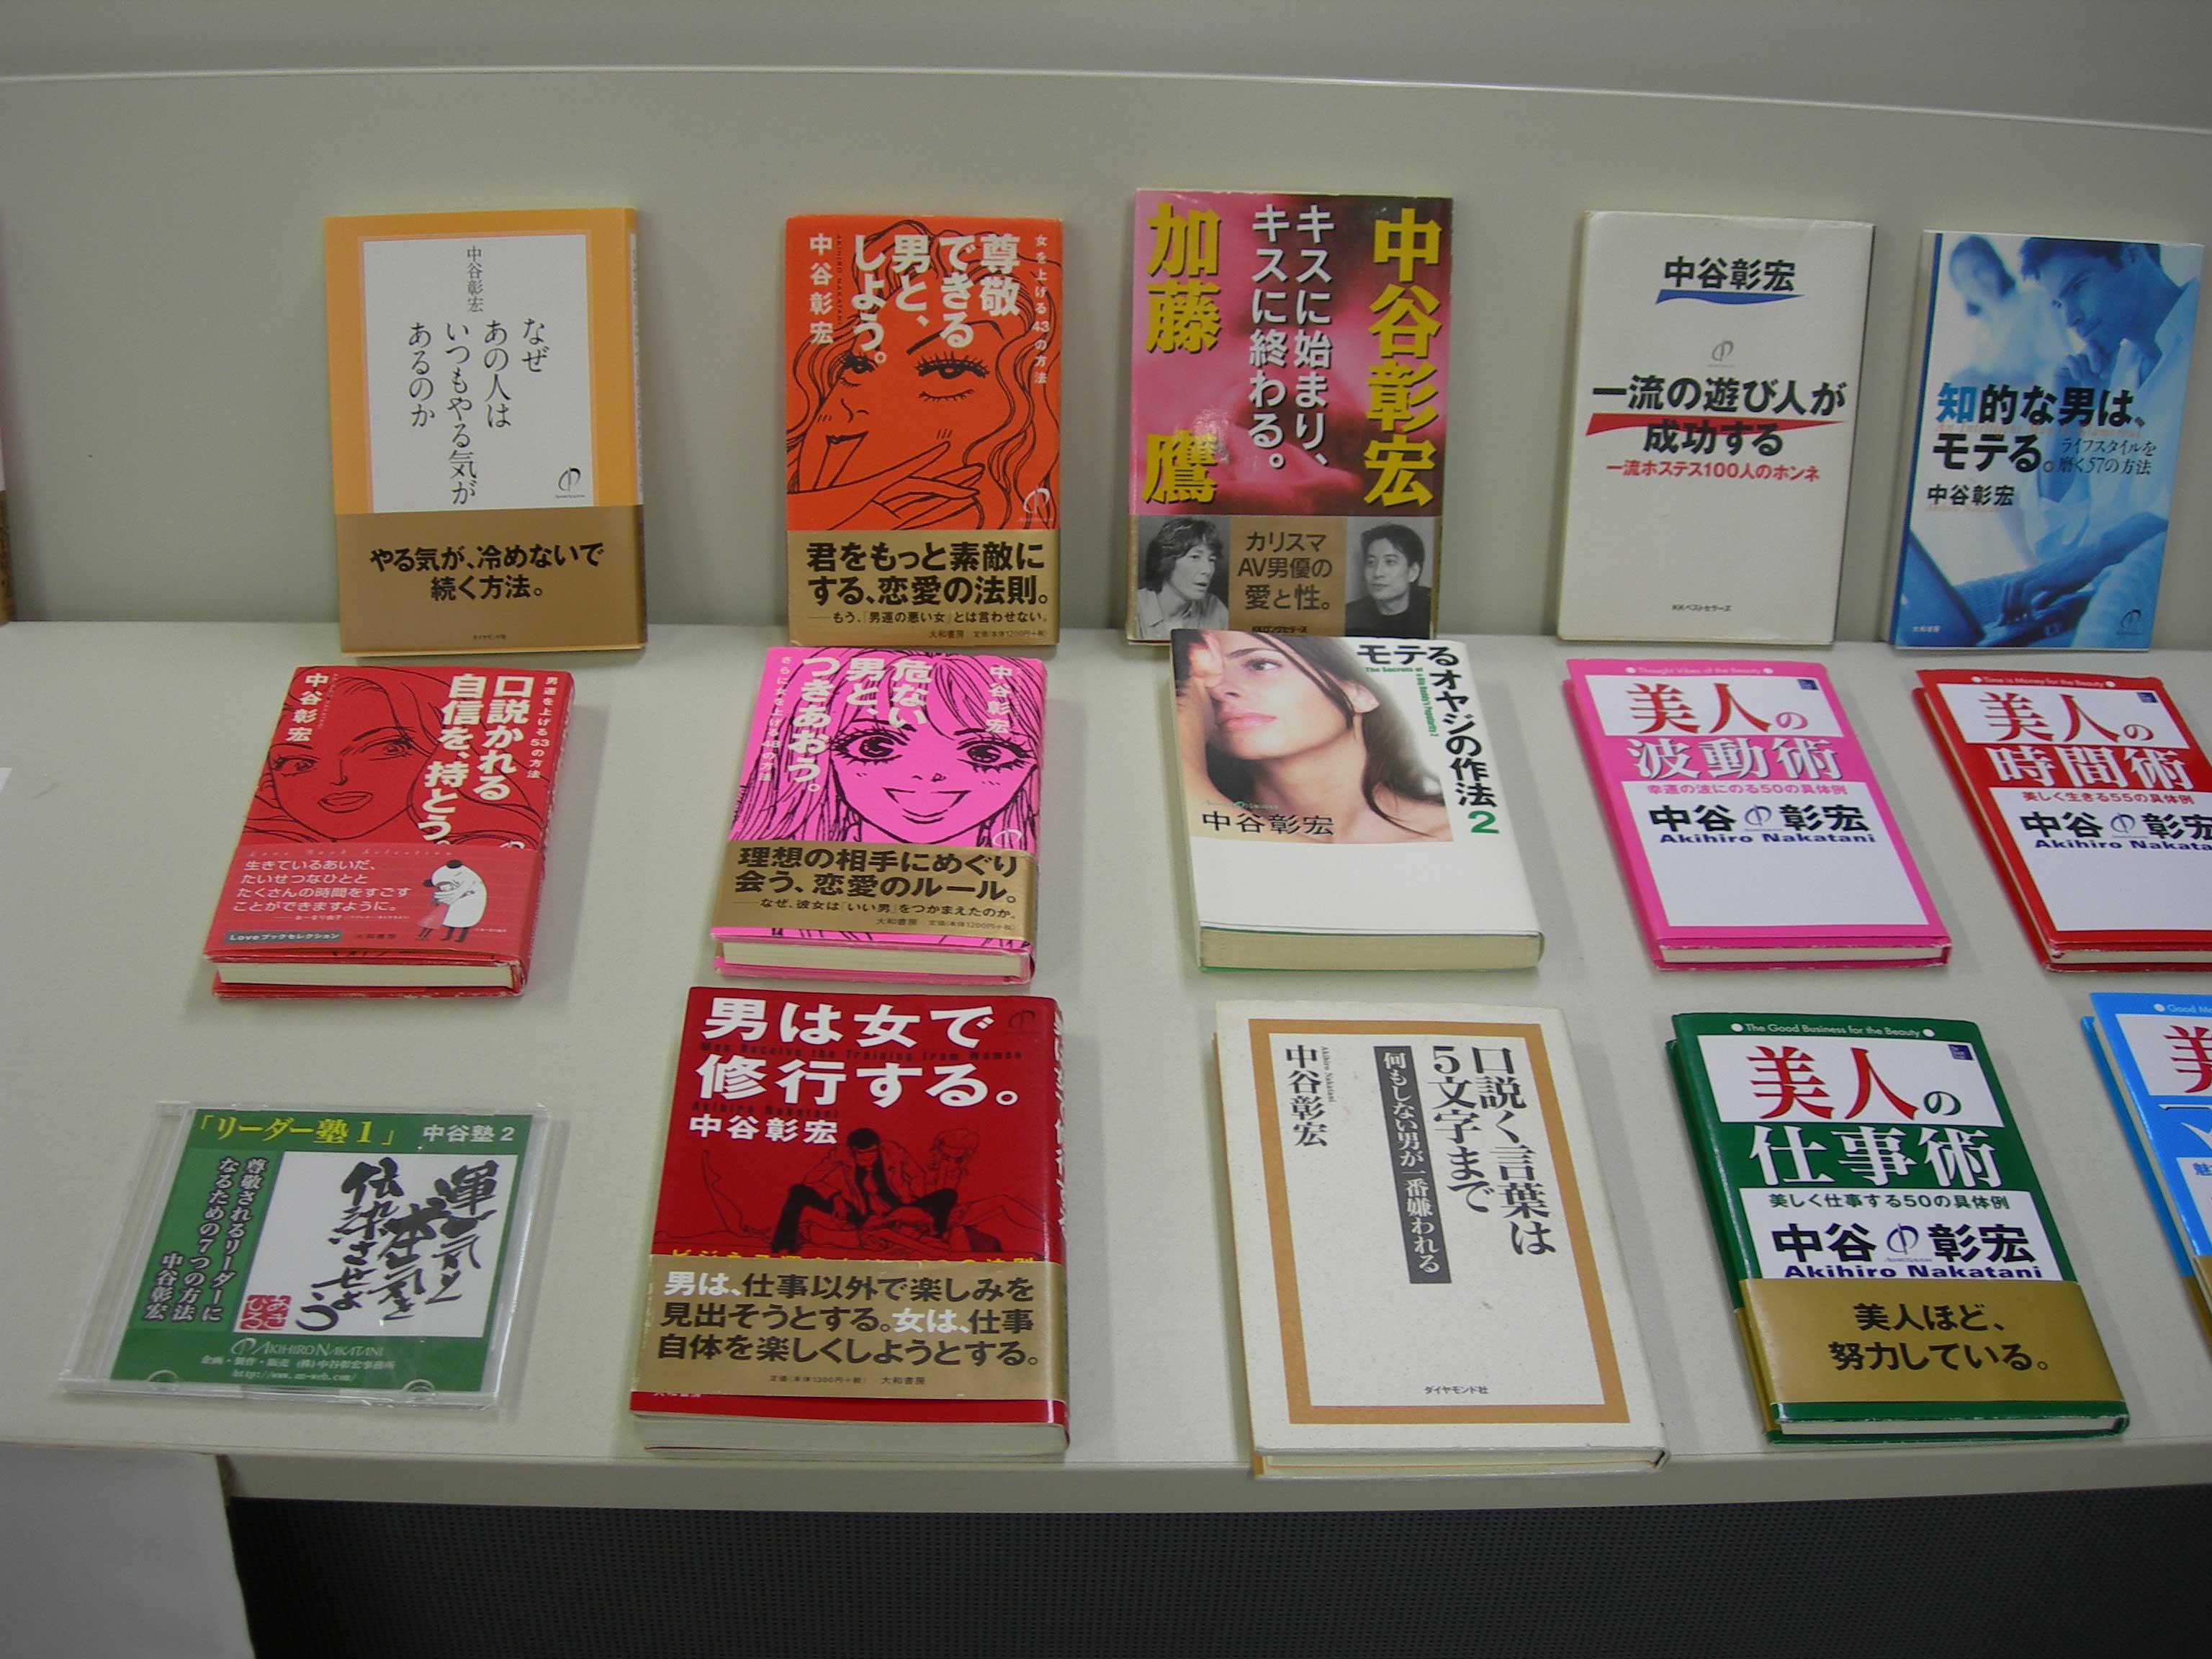 20100314_紹介コーナー_1.jpg